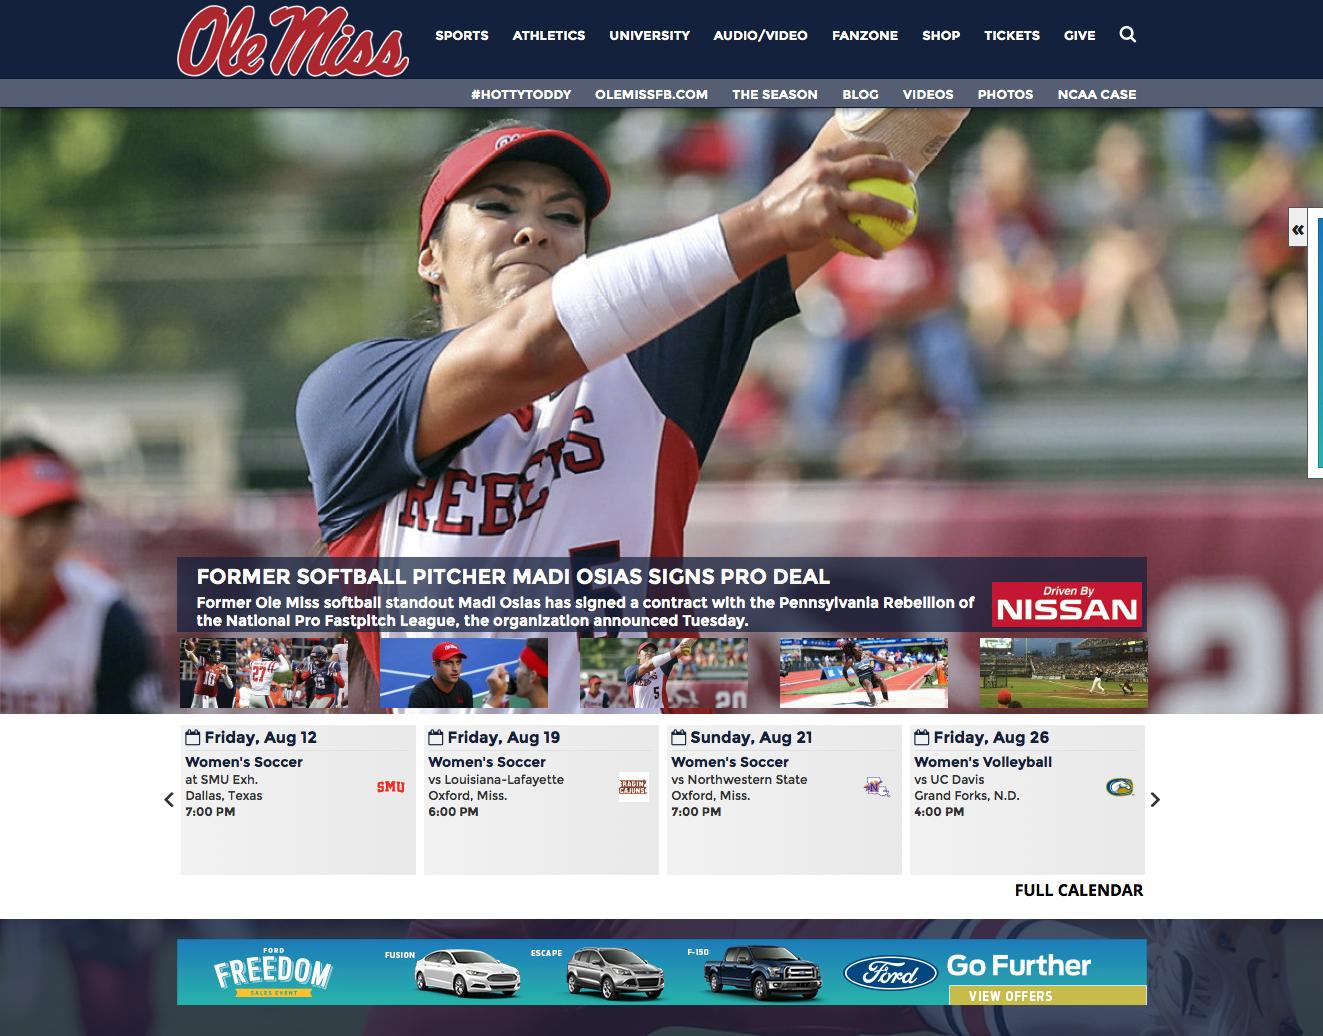 OleMissSports.com_-_Ole_Miss_Rebels_Official_Athletic_Site_-_2016-07-05_15.47.18.png